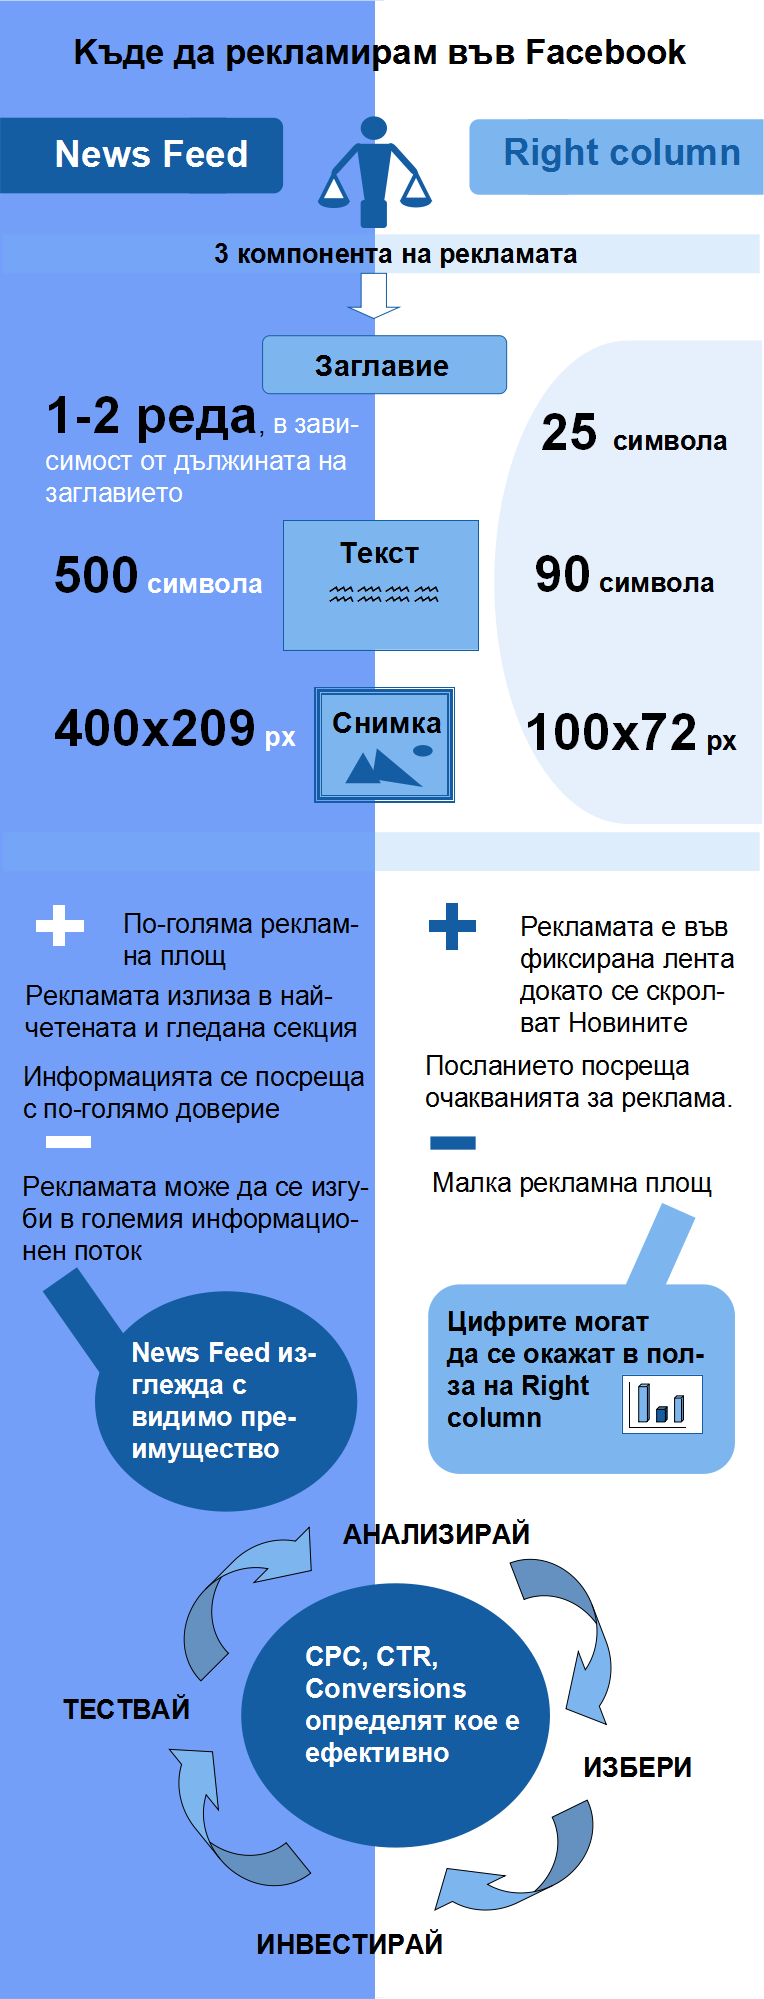 Facebook-adv-News-Feed-vs-Right-Column1